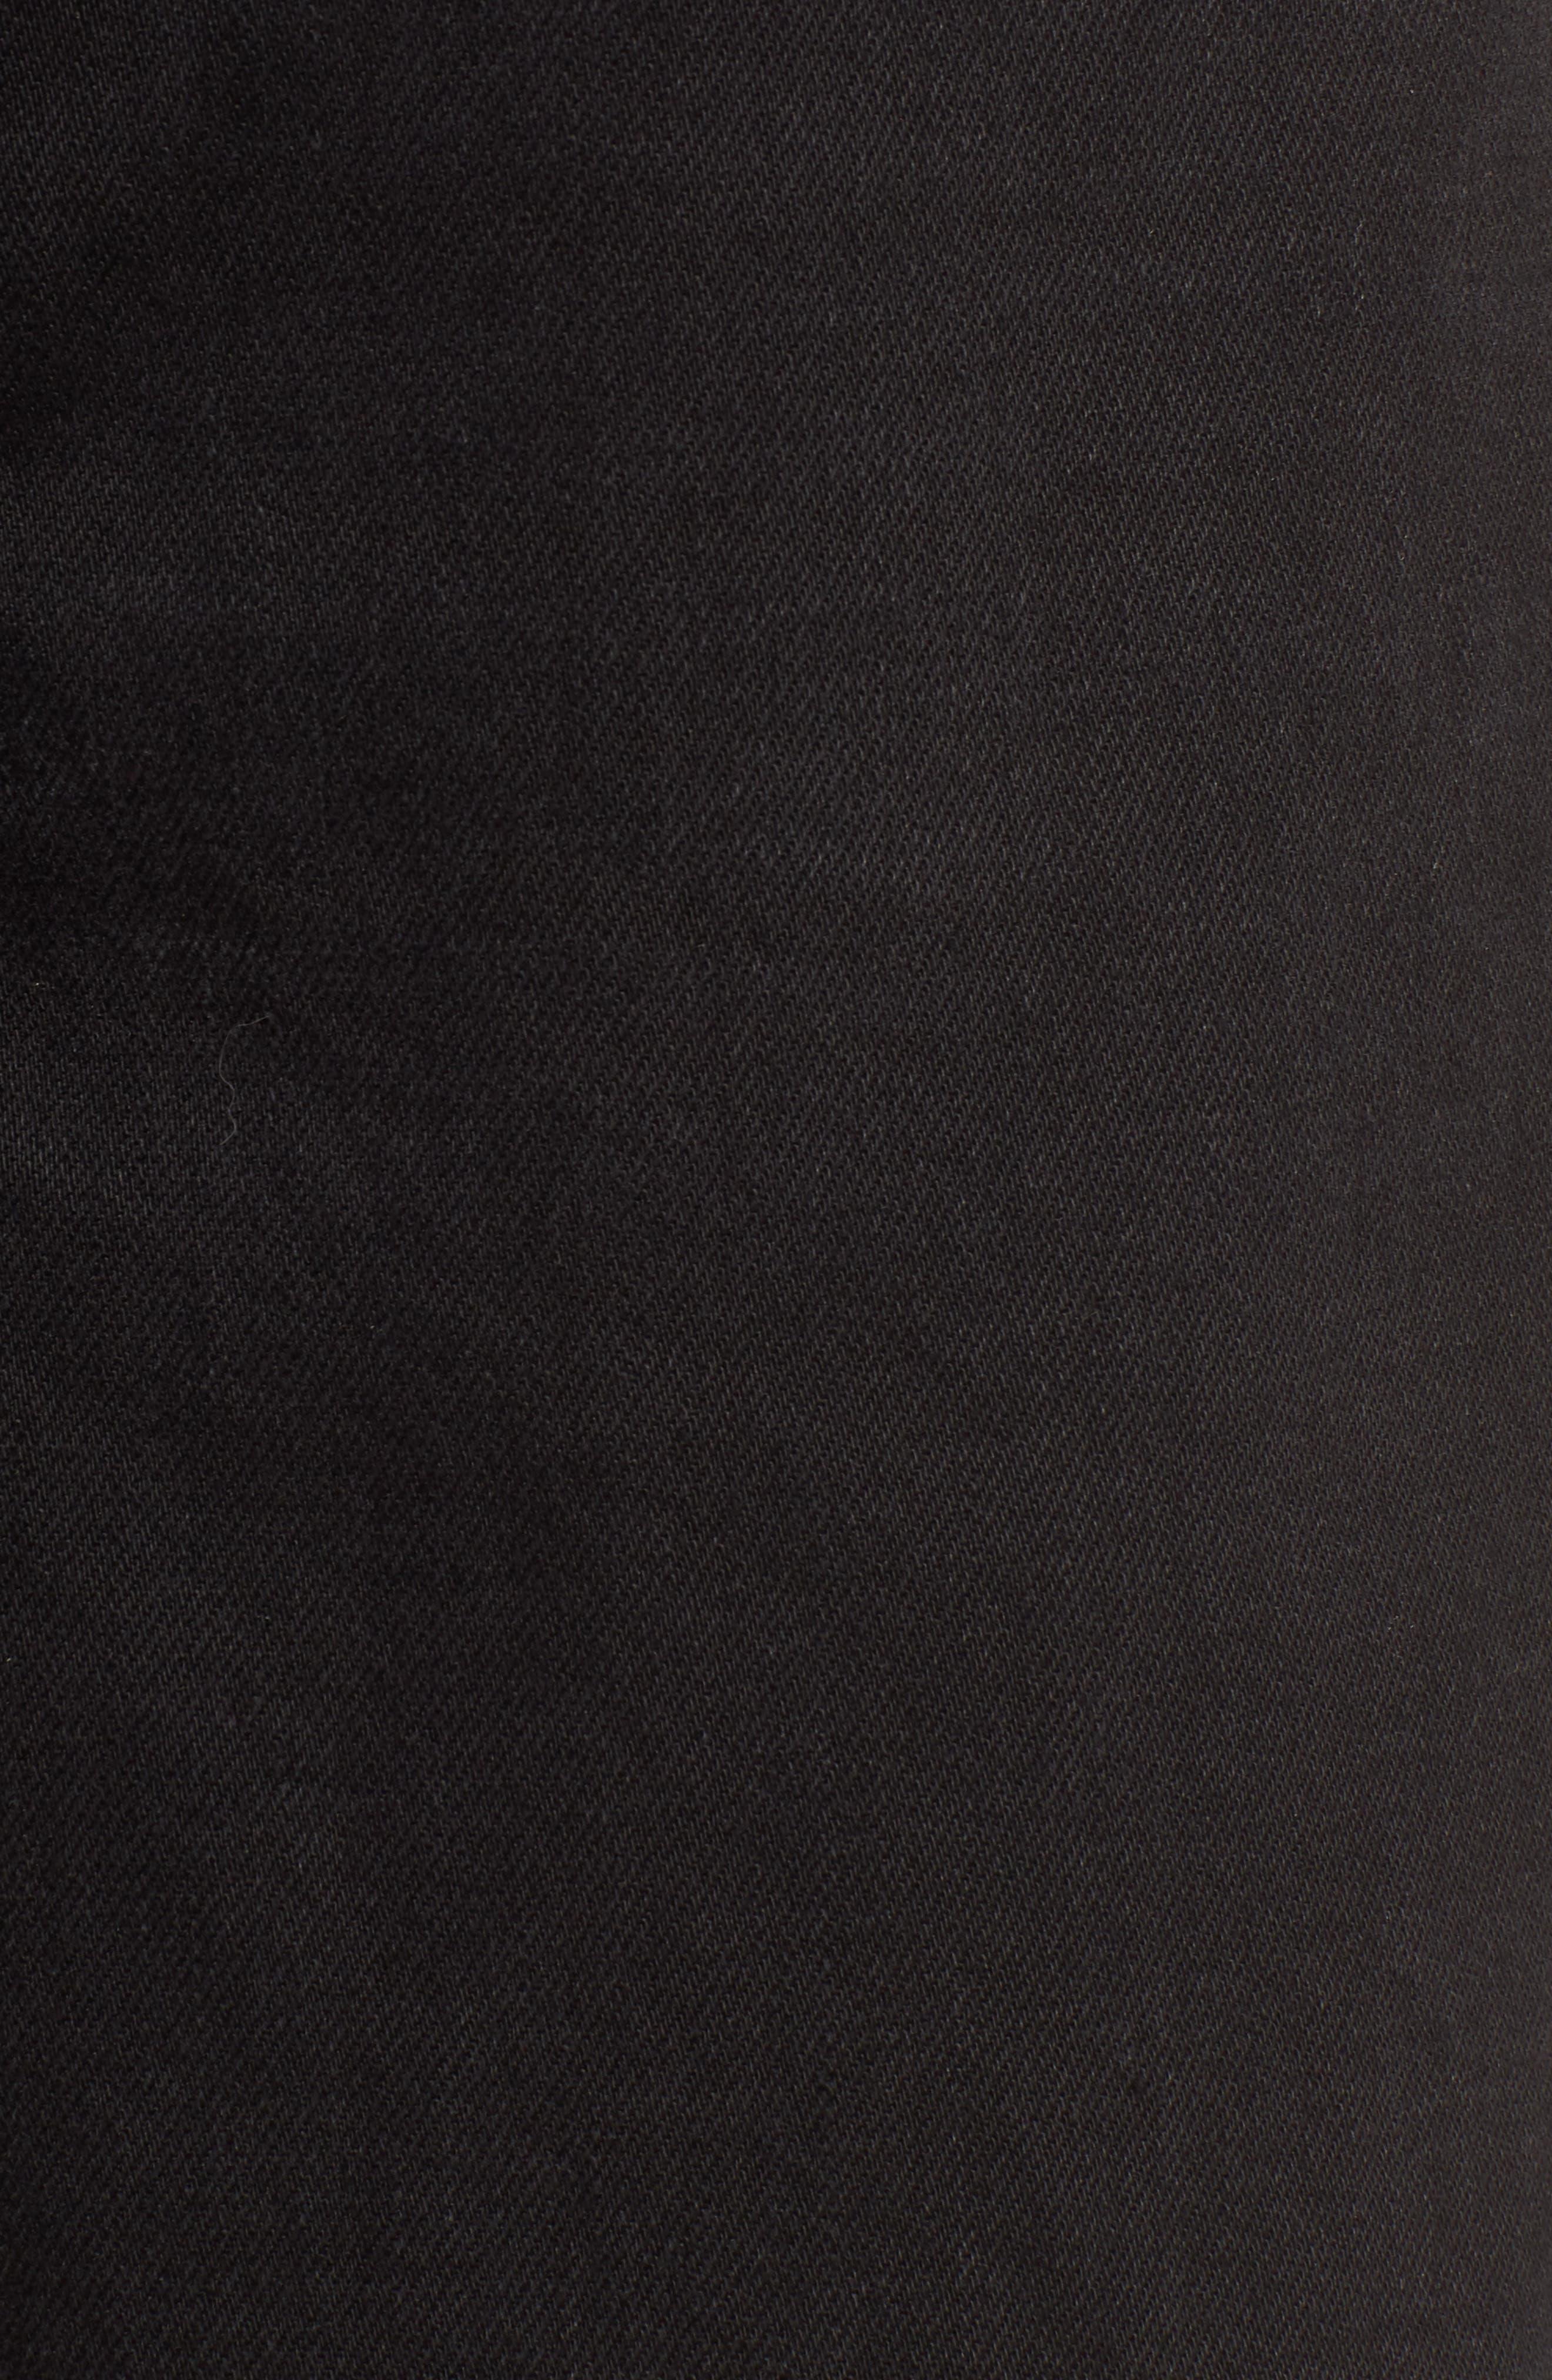 TOPSHOP, Wide Leg Crop Jeans, Alternate thumbnail 6, color, WASHED BLACK